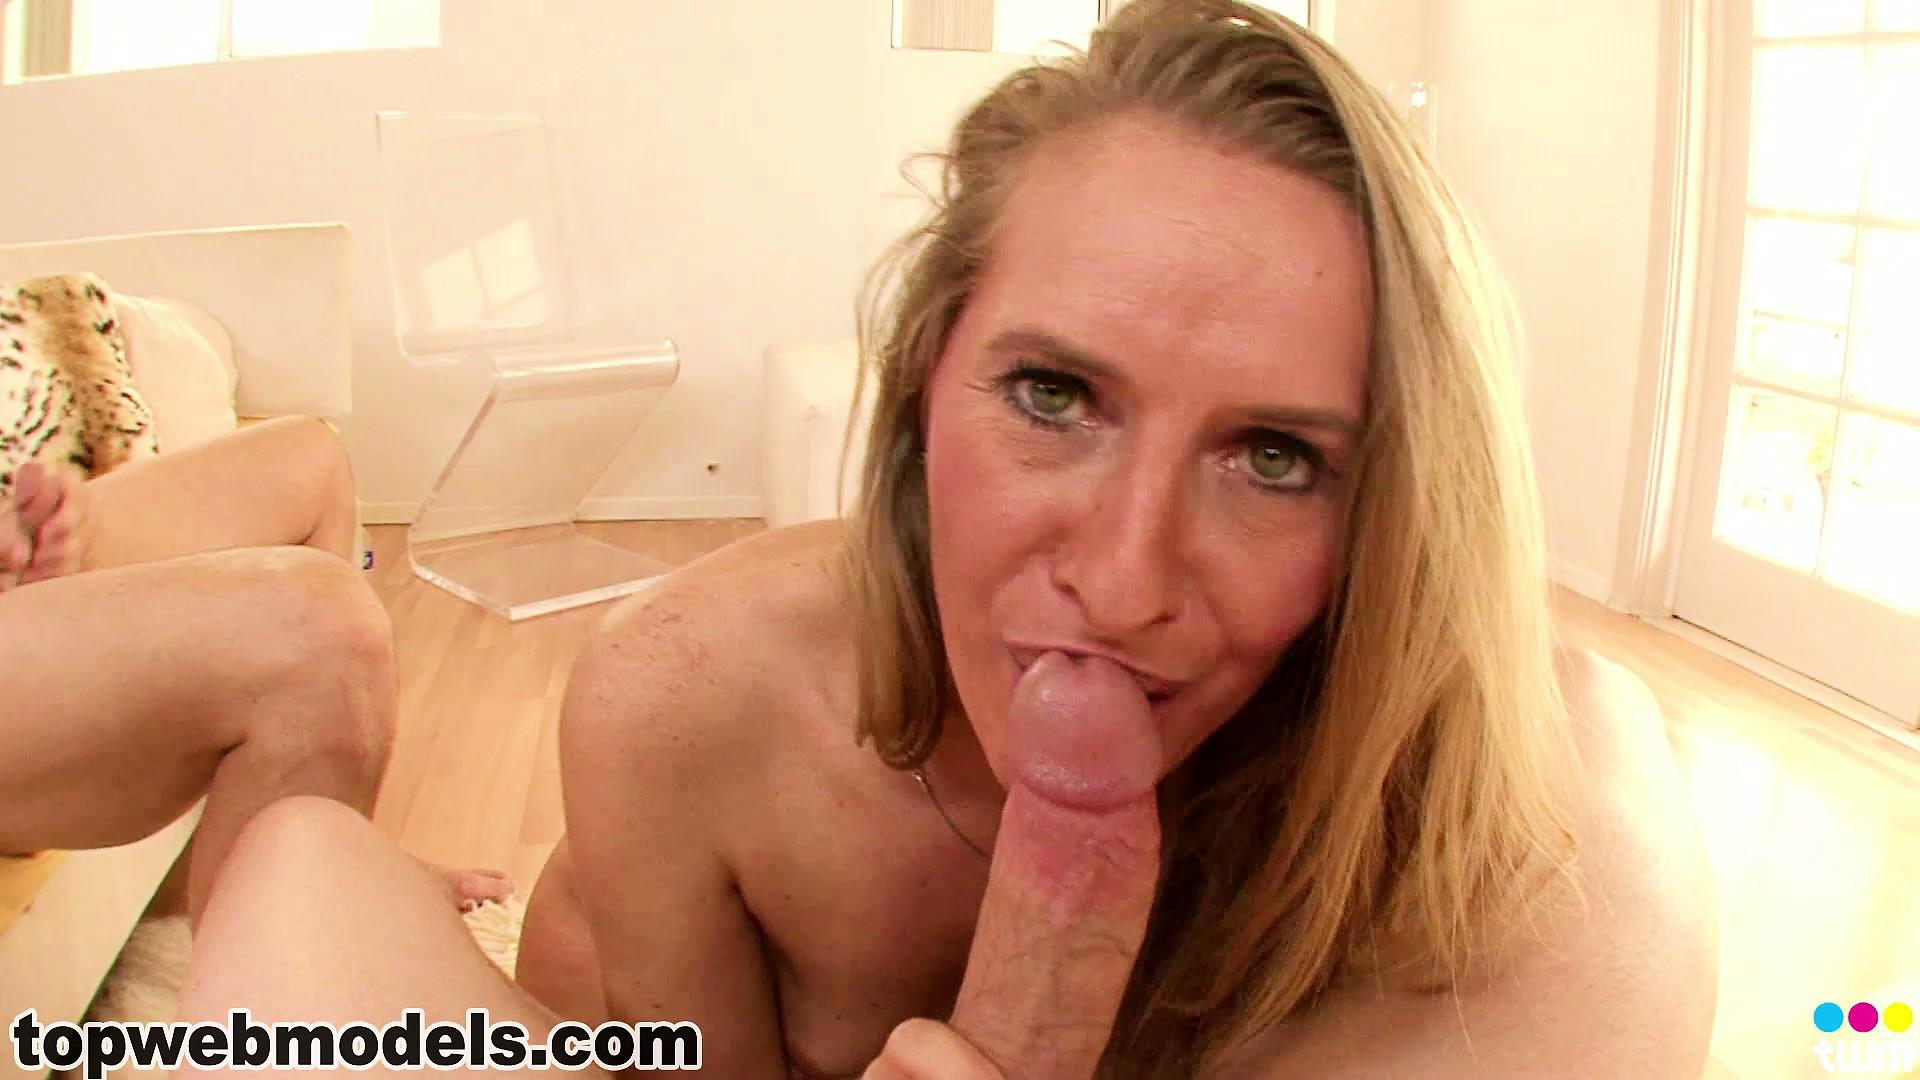 Tiny blonde milf porn